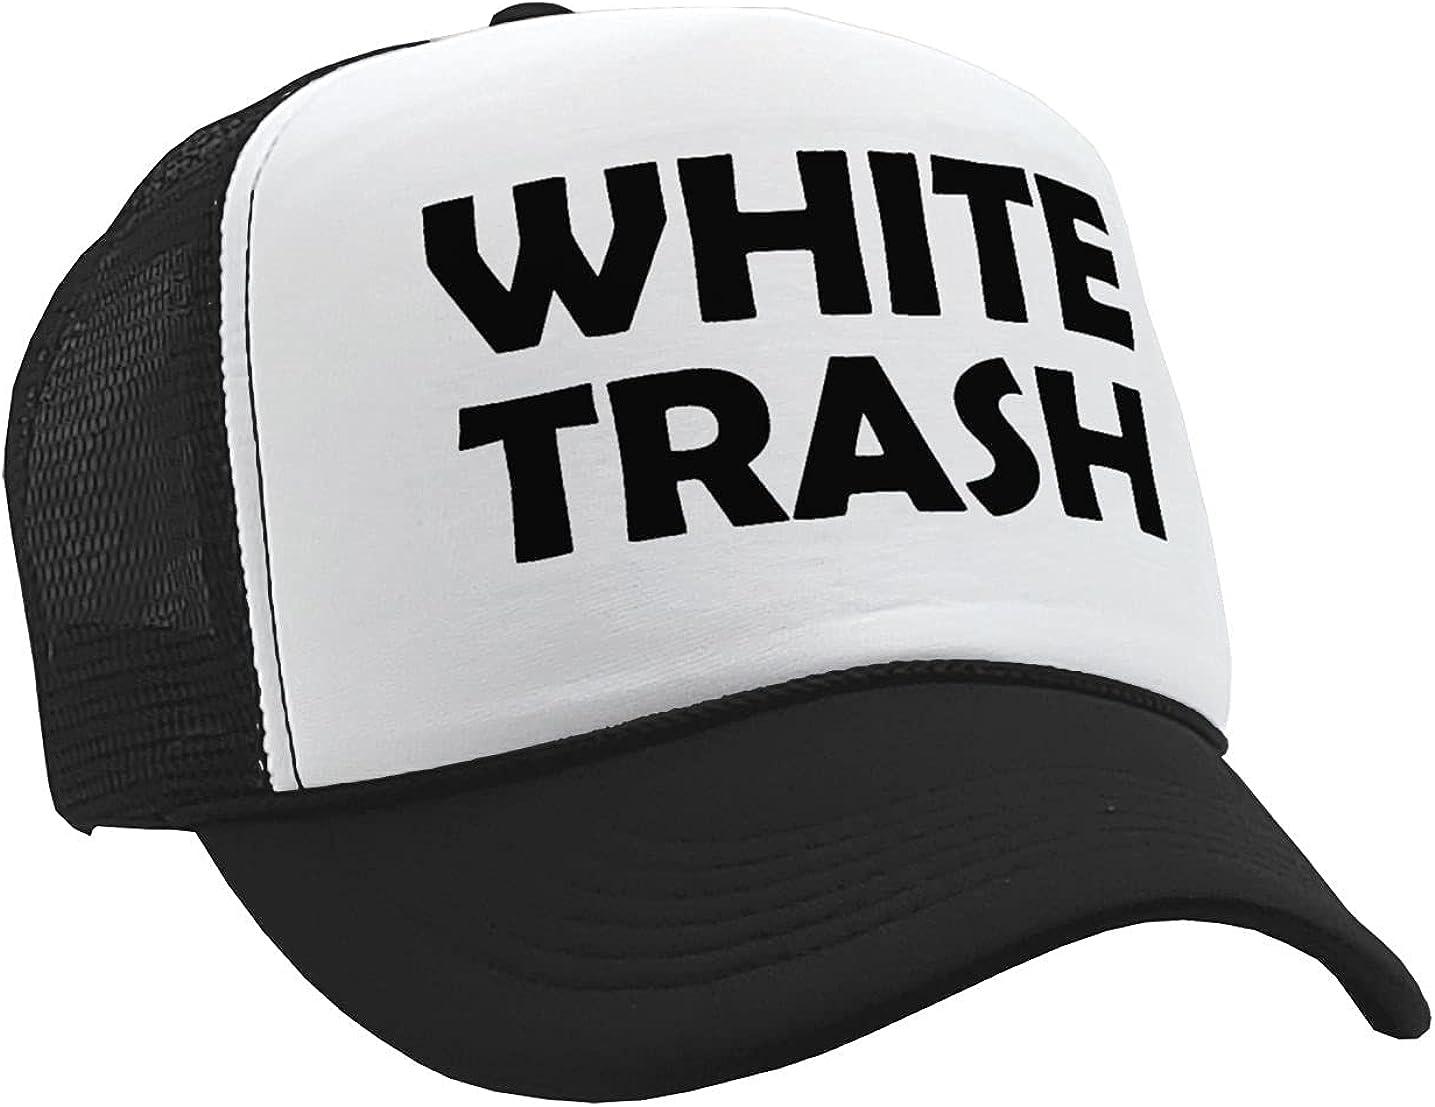 The Goozler - White Trash - Redneck Hillbilly Funny Prank - Vintage Retro Style Trucker Cap Hat